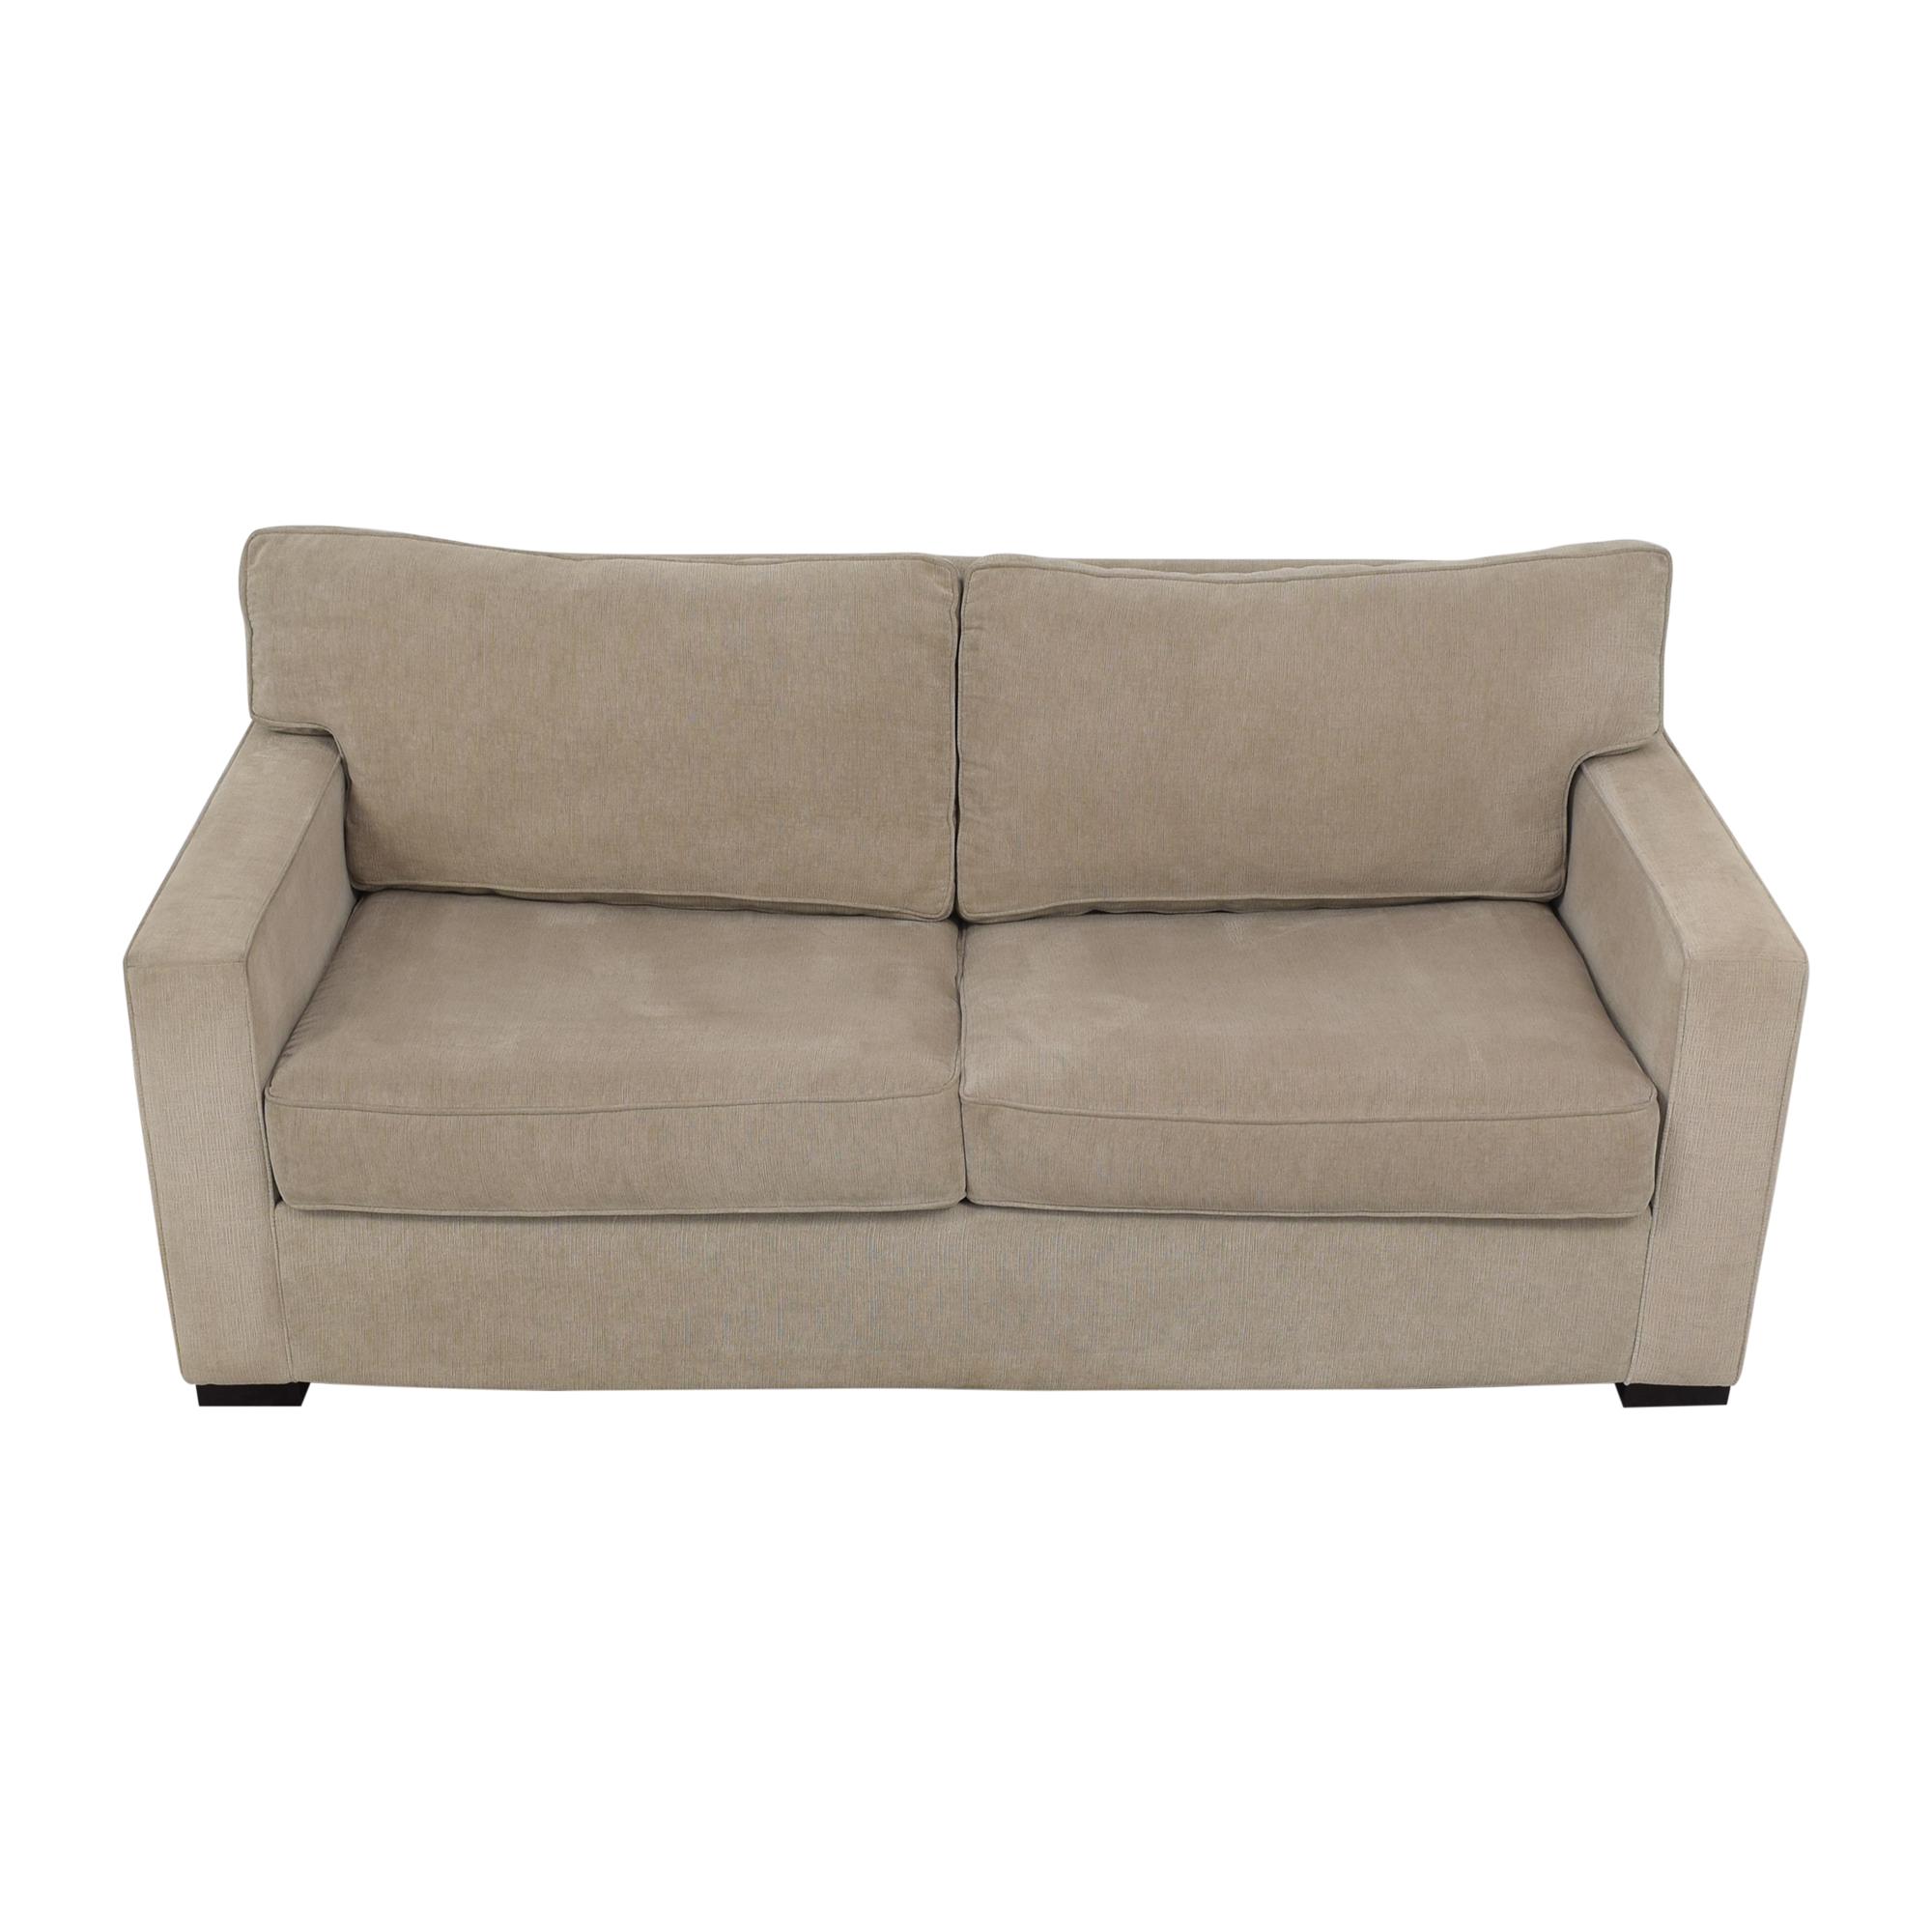 Macy's Two Cushion Sleeper Sofa / Sofas